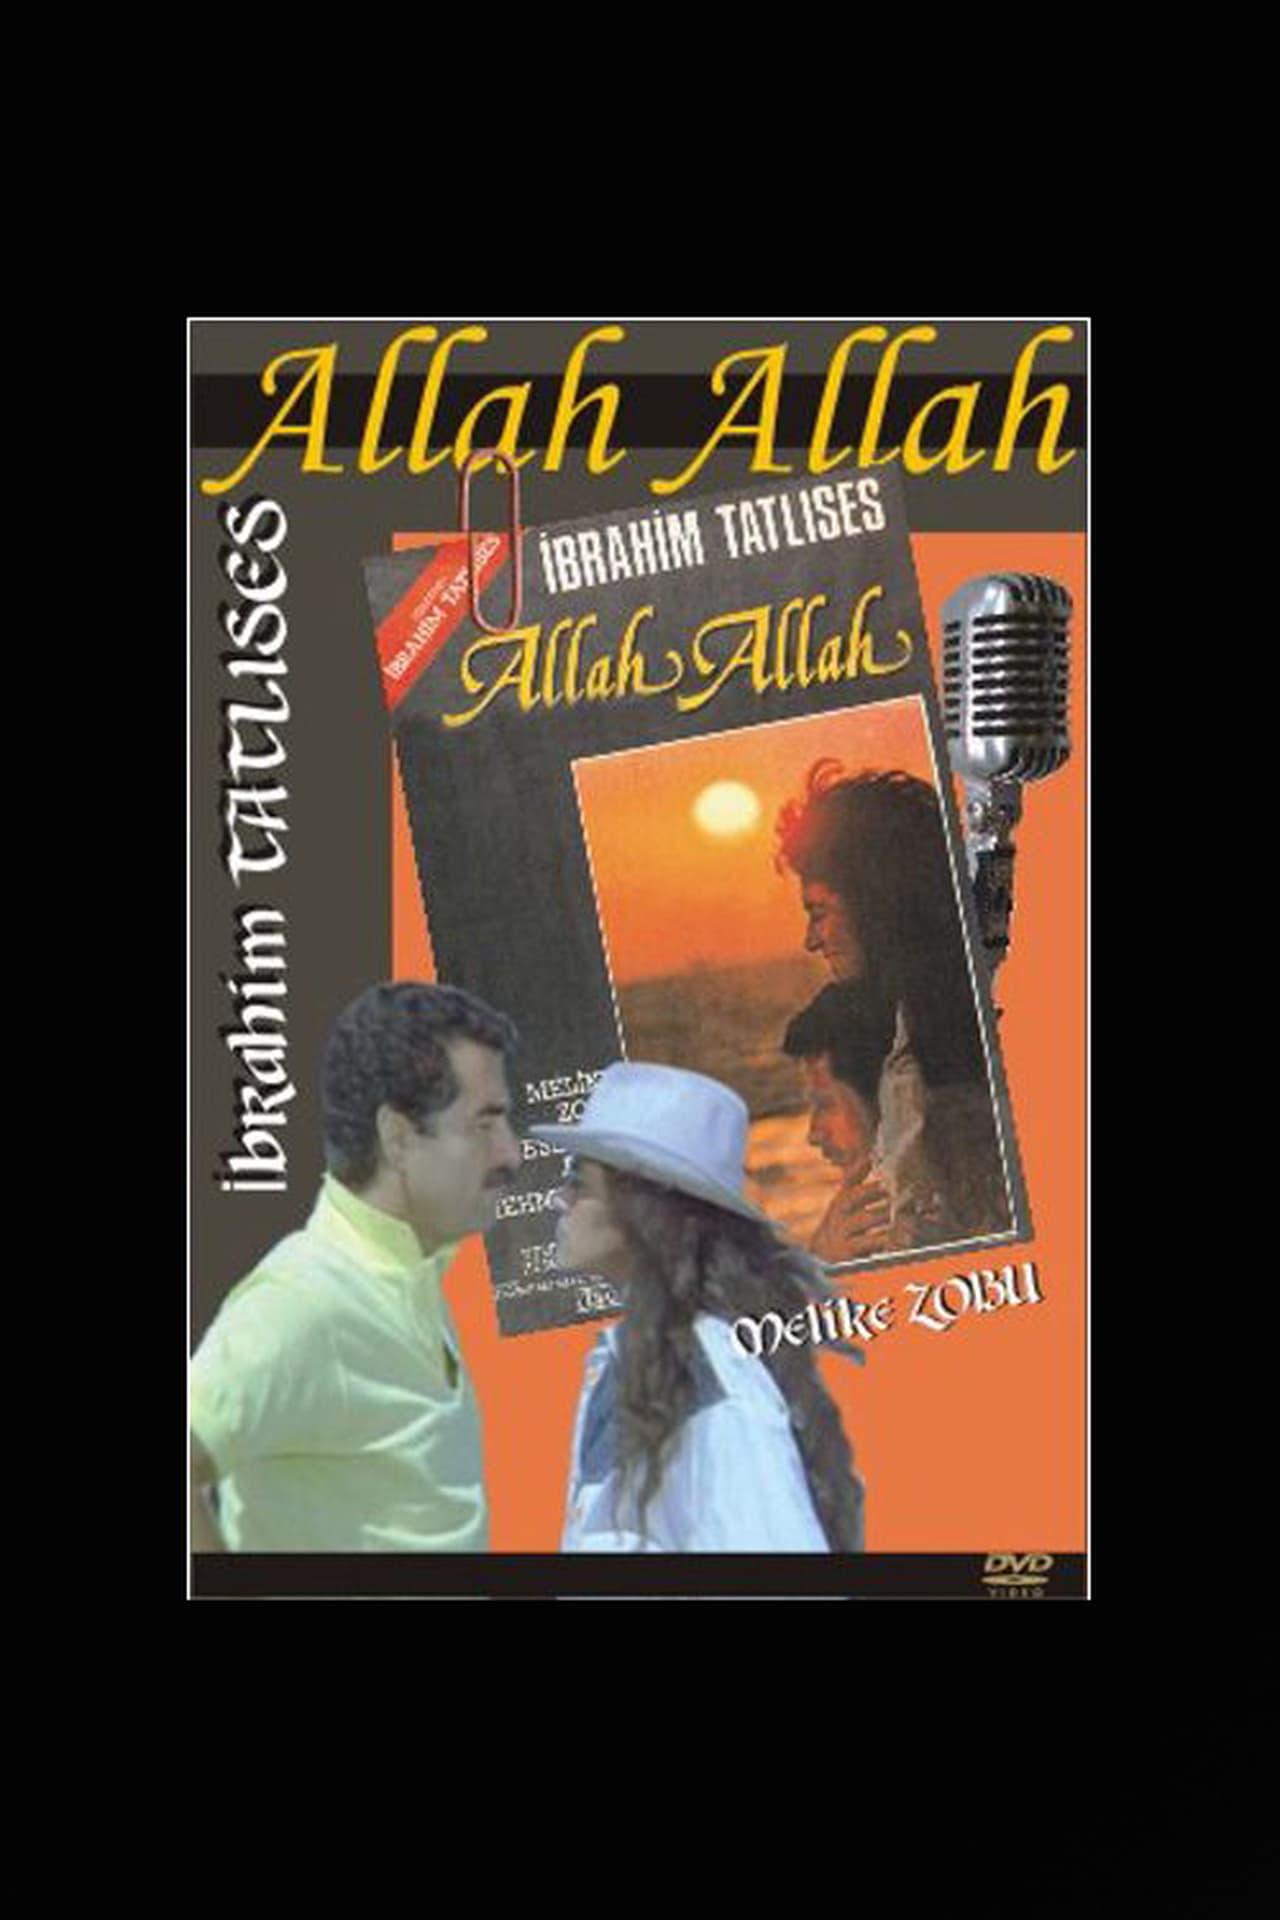 Allah allah ((1987))